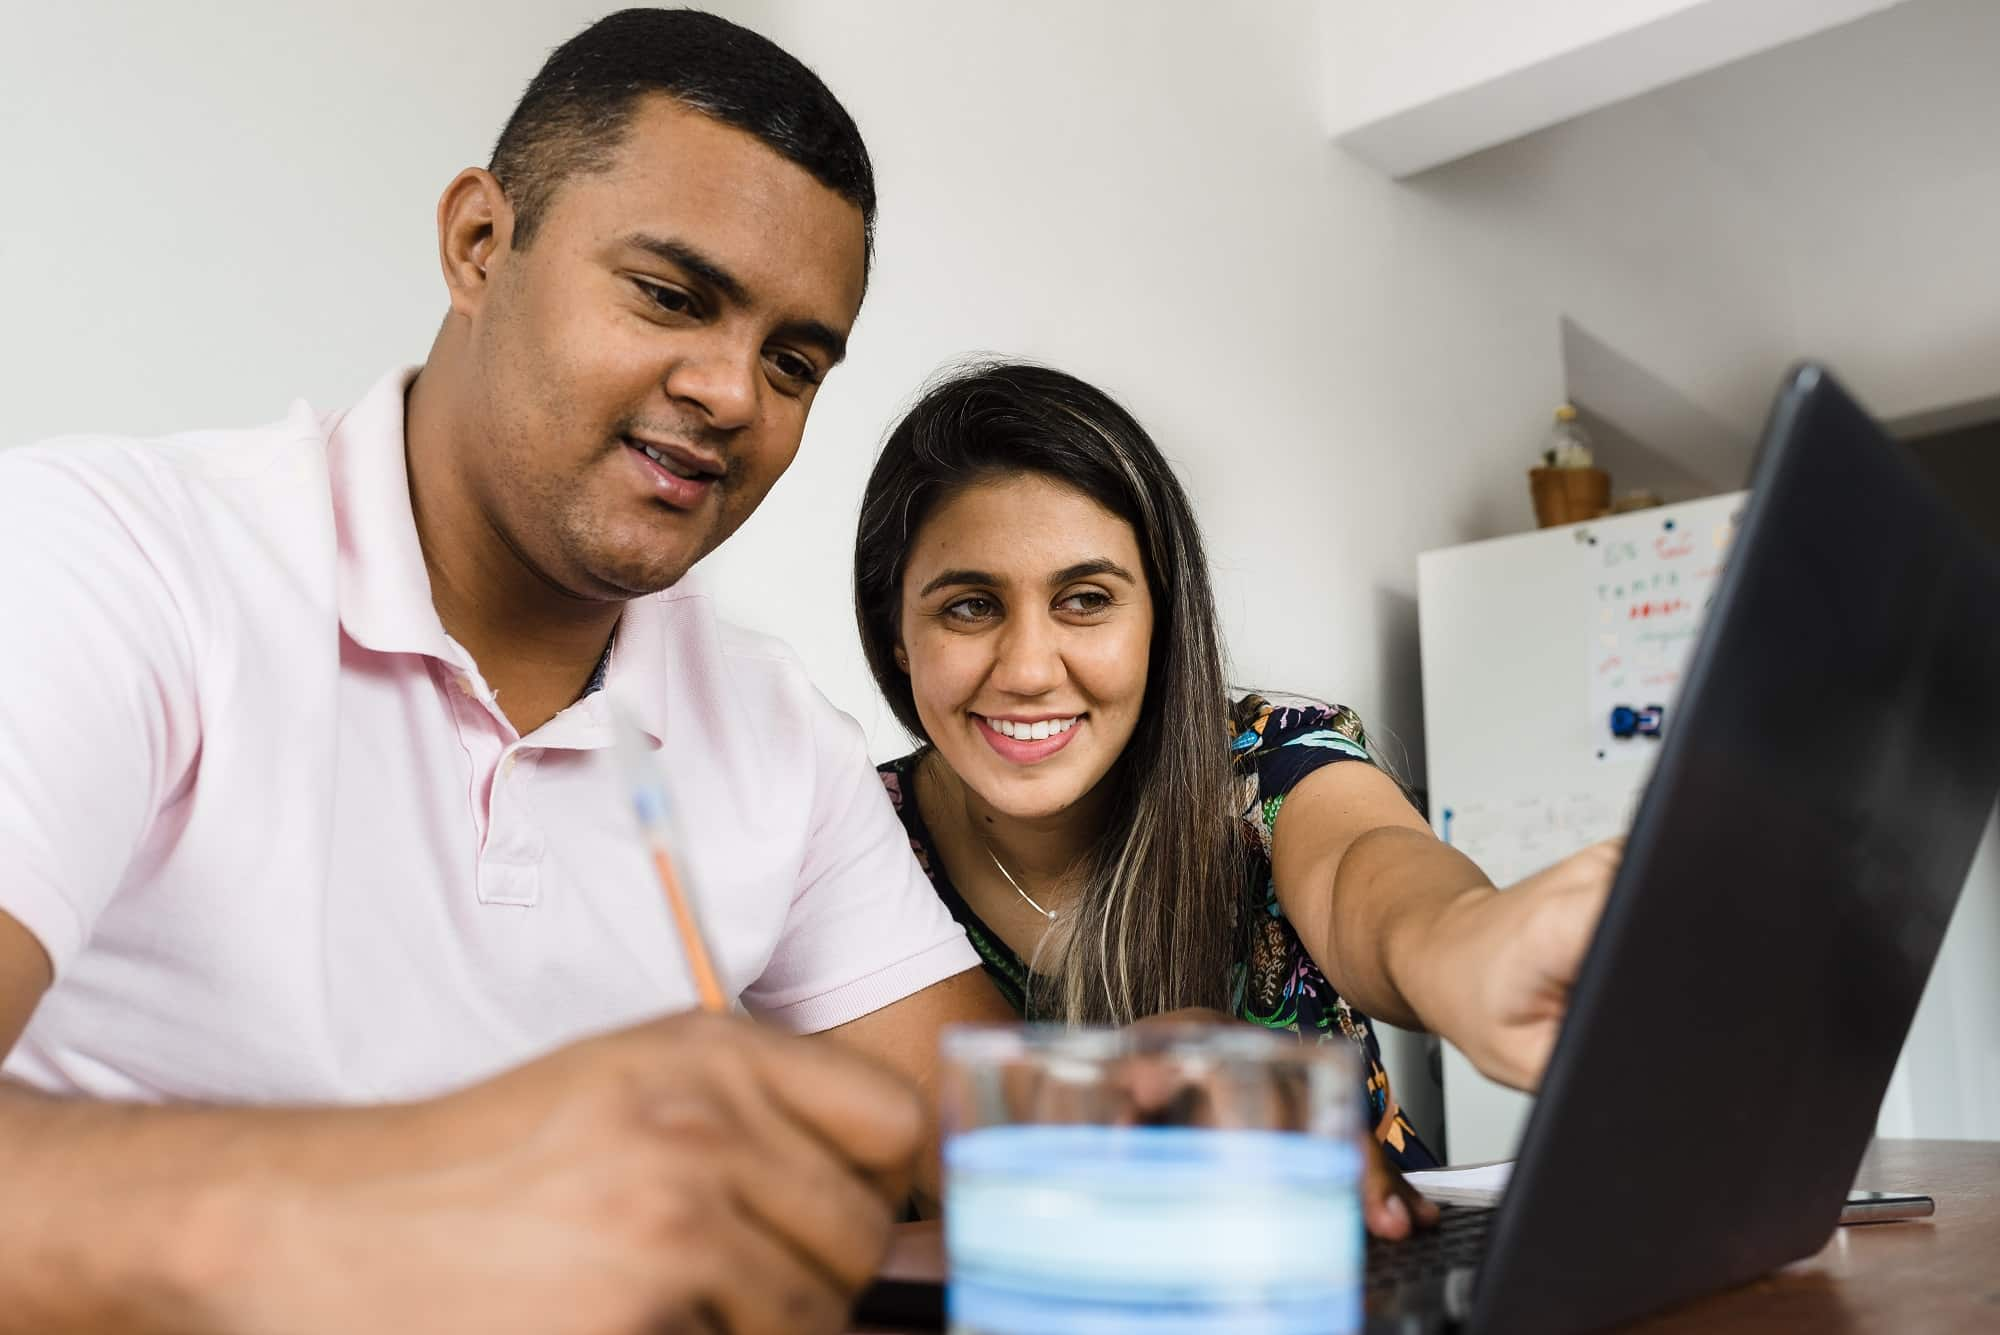 online shopping, couple, family, home interior, laptop, travel, love, joy